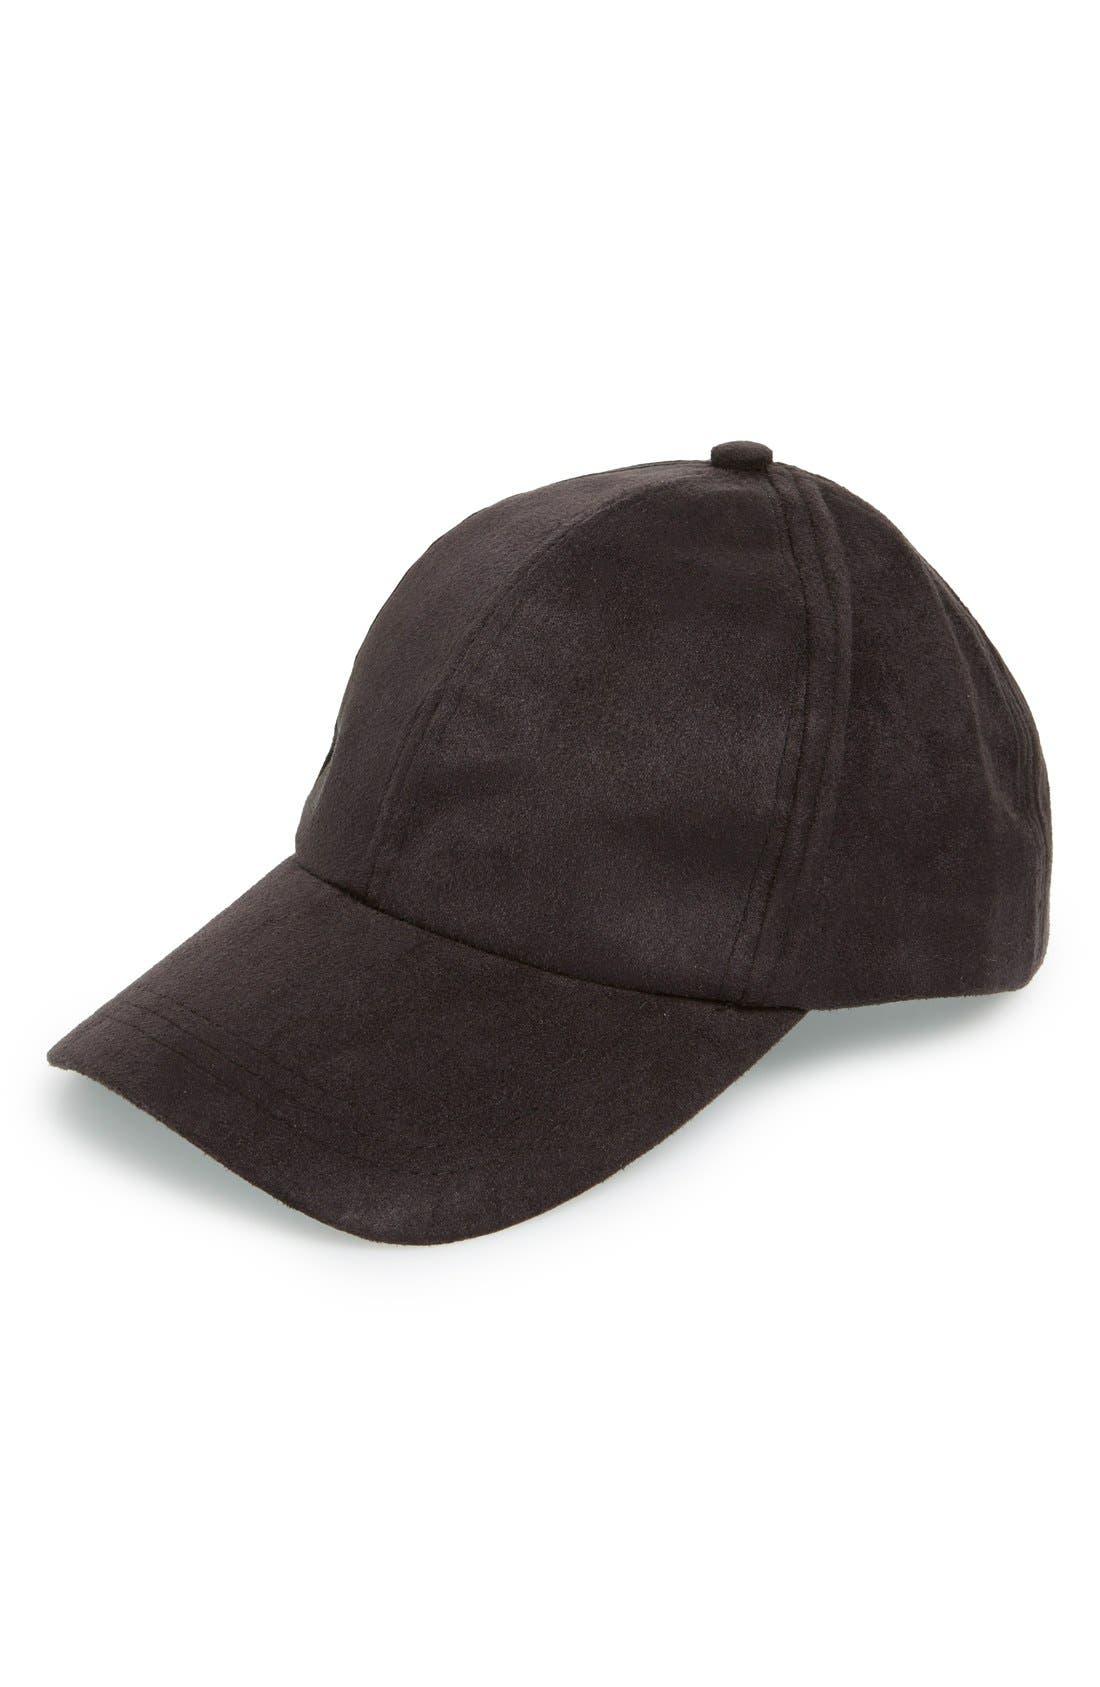 Snapback Baseball Cap,                             Main thumbnail 1, color,                             001